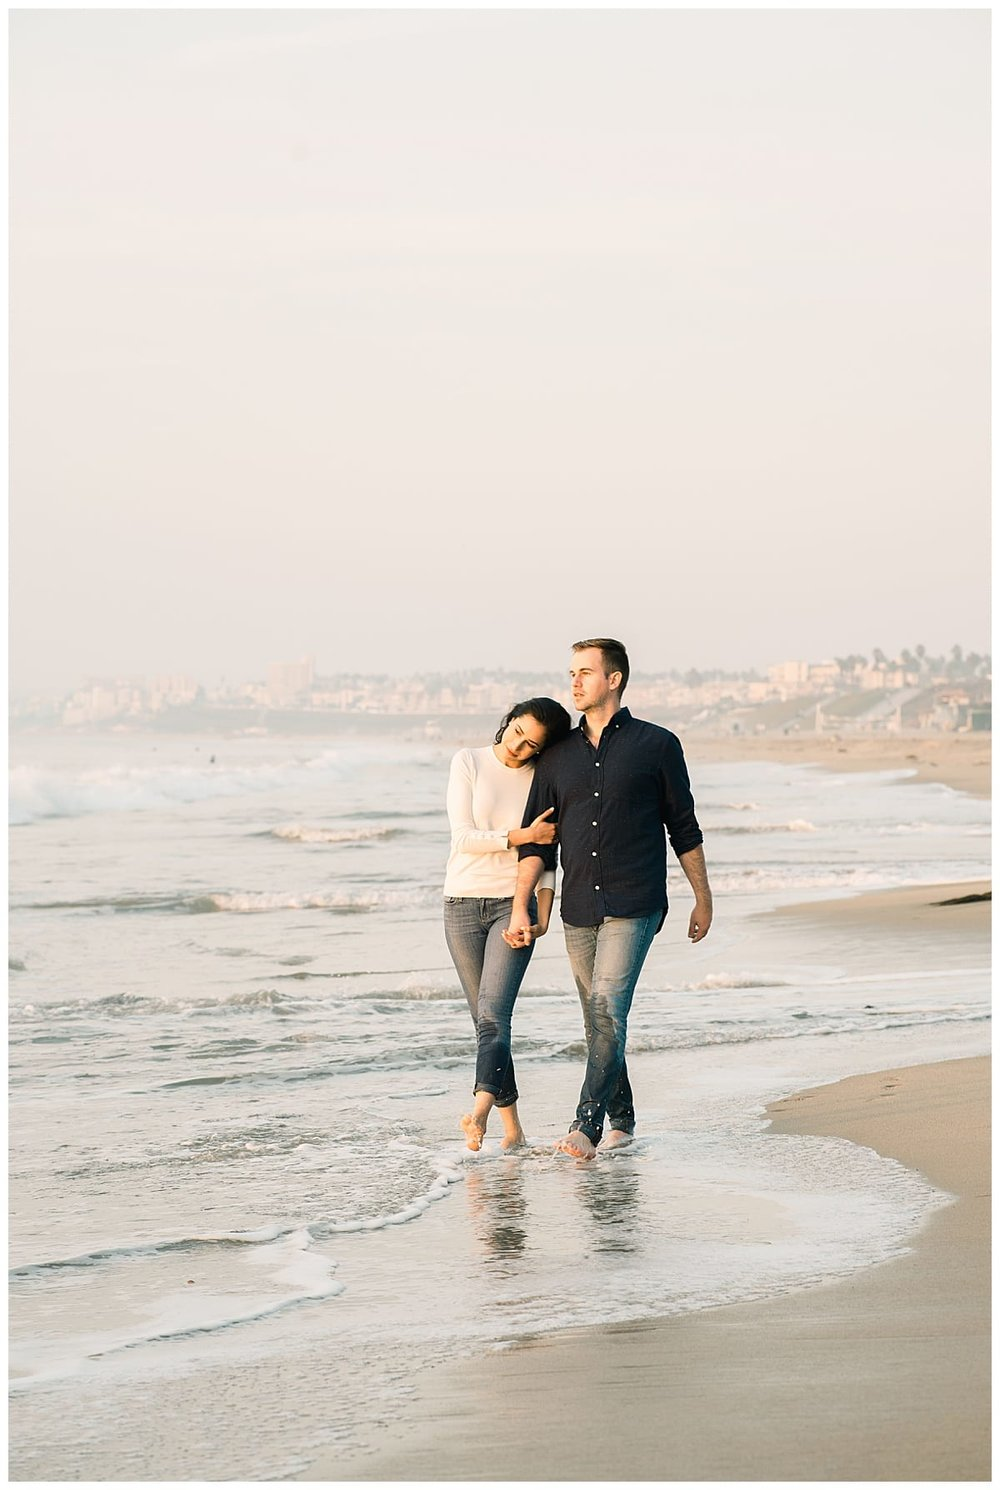 Palos-Verdes-Engagement-Sjhoot-Carissa-Woo-Photography_0019.jpg